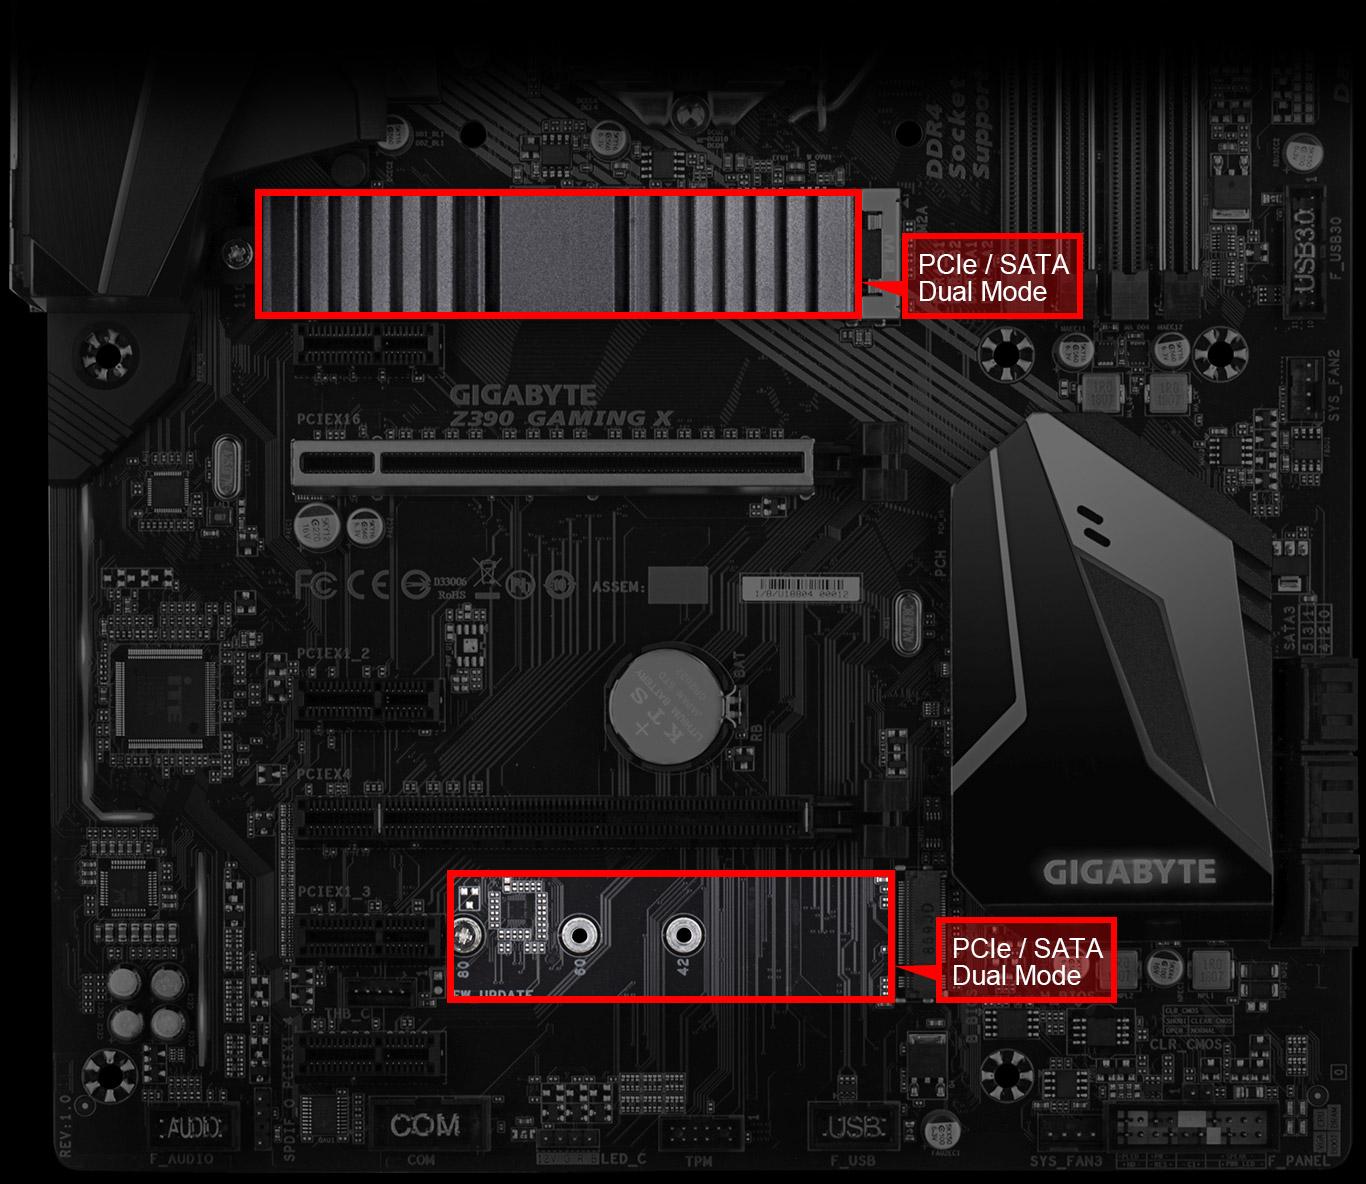 GIGABYTE Z390 GAMING X LGA 1151 (300 Series) ATX Intel Motherboard -  Newegg com